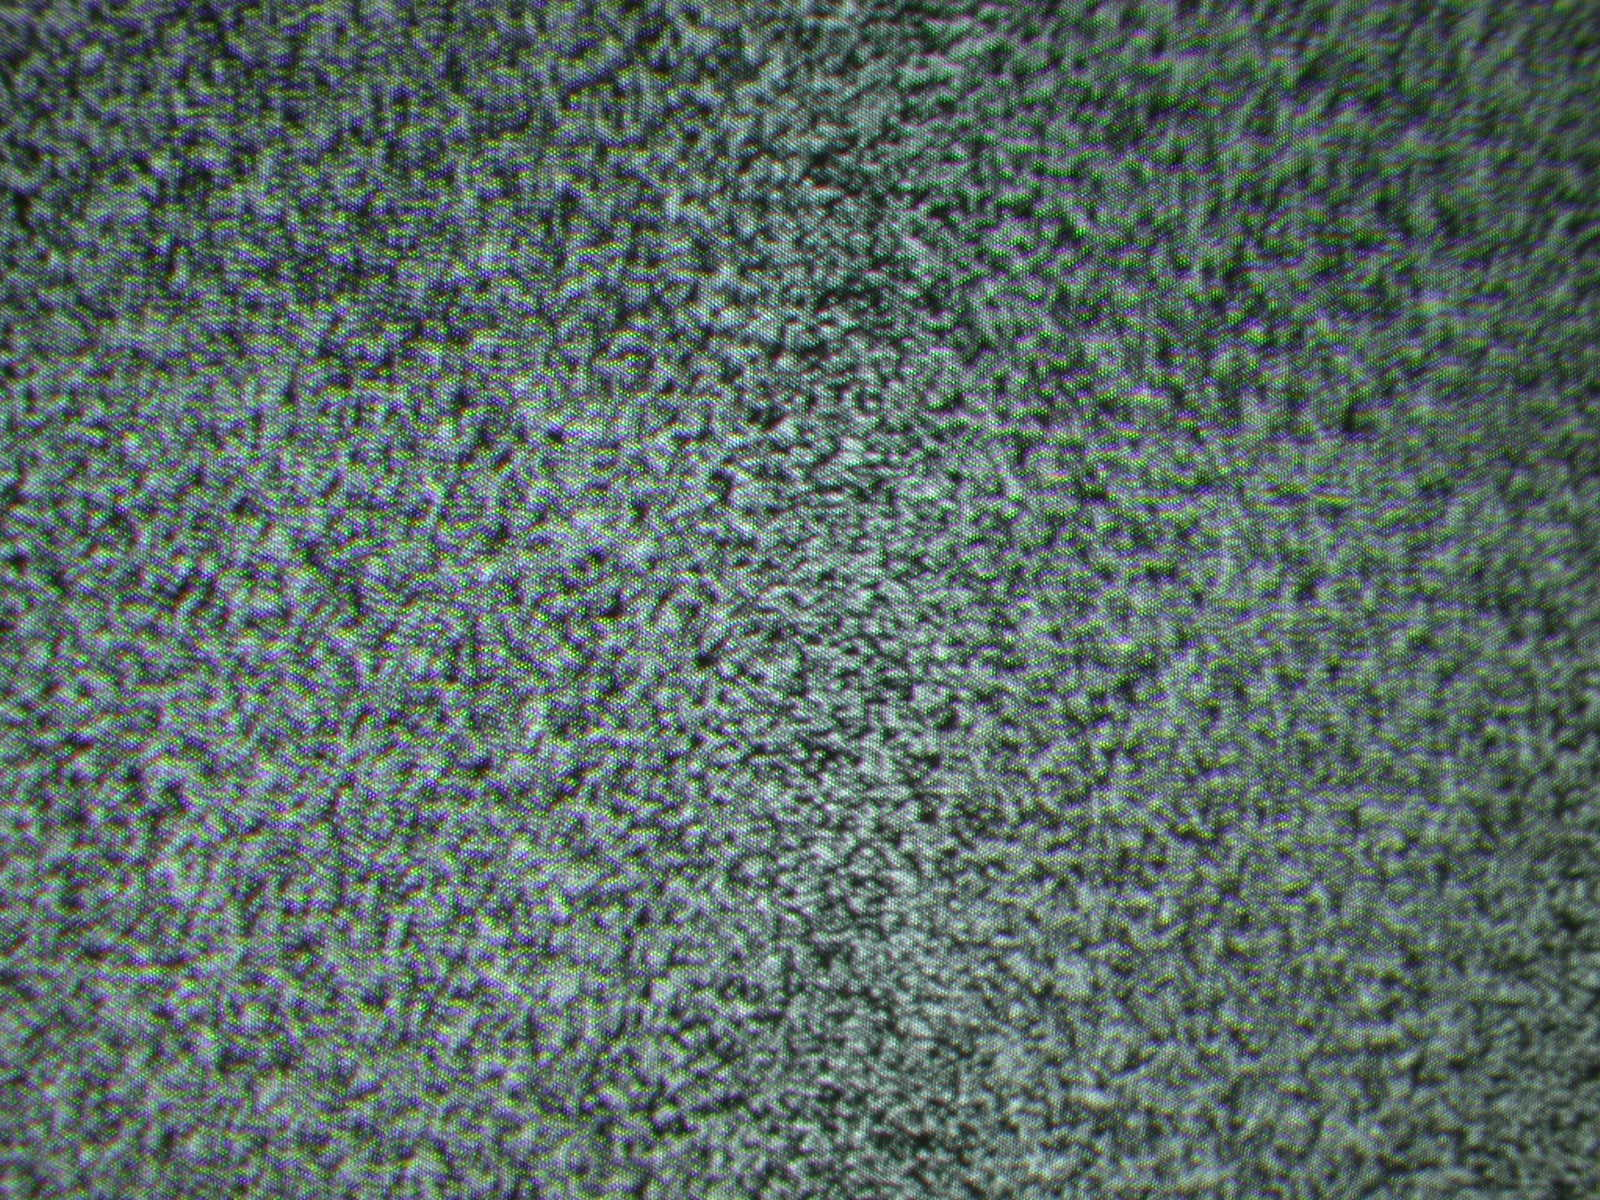 static wallpaper - photo #39